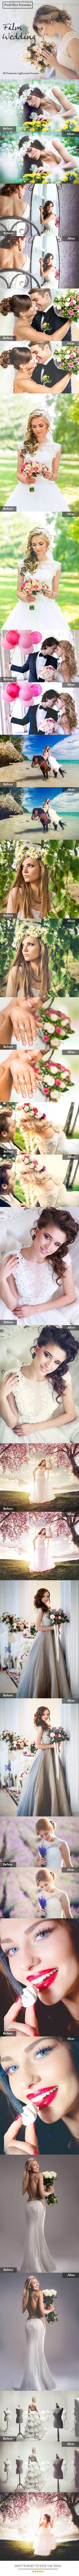 50 Premium Film-Wedding Lightroom Presets. Download here: http://graphicriver.net/item/50-premium-filmwedding-lightroom-presets/16696406?ref=ksioks